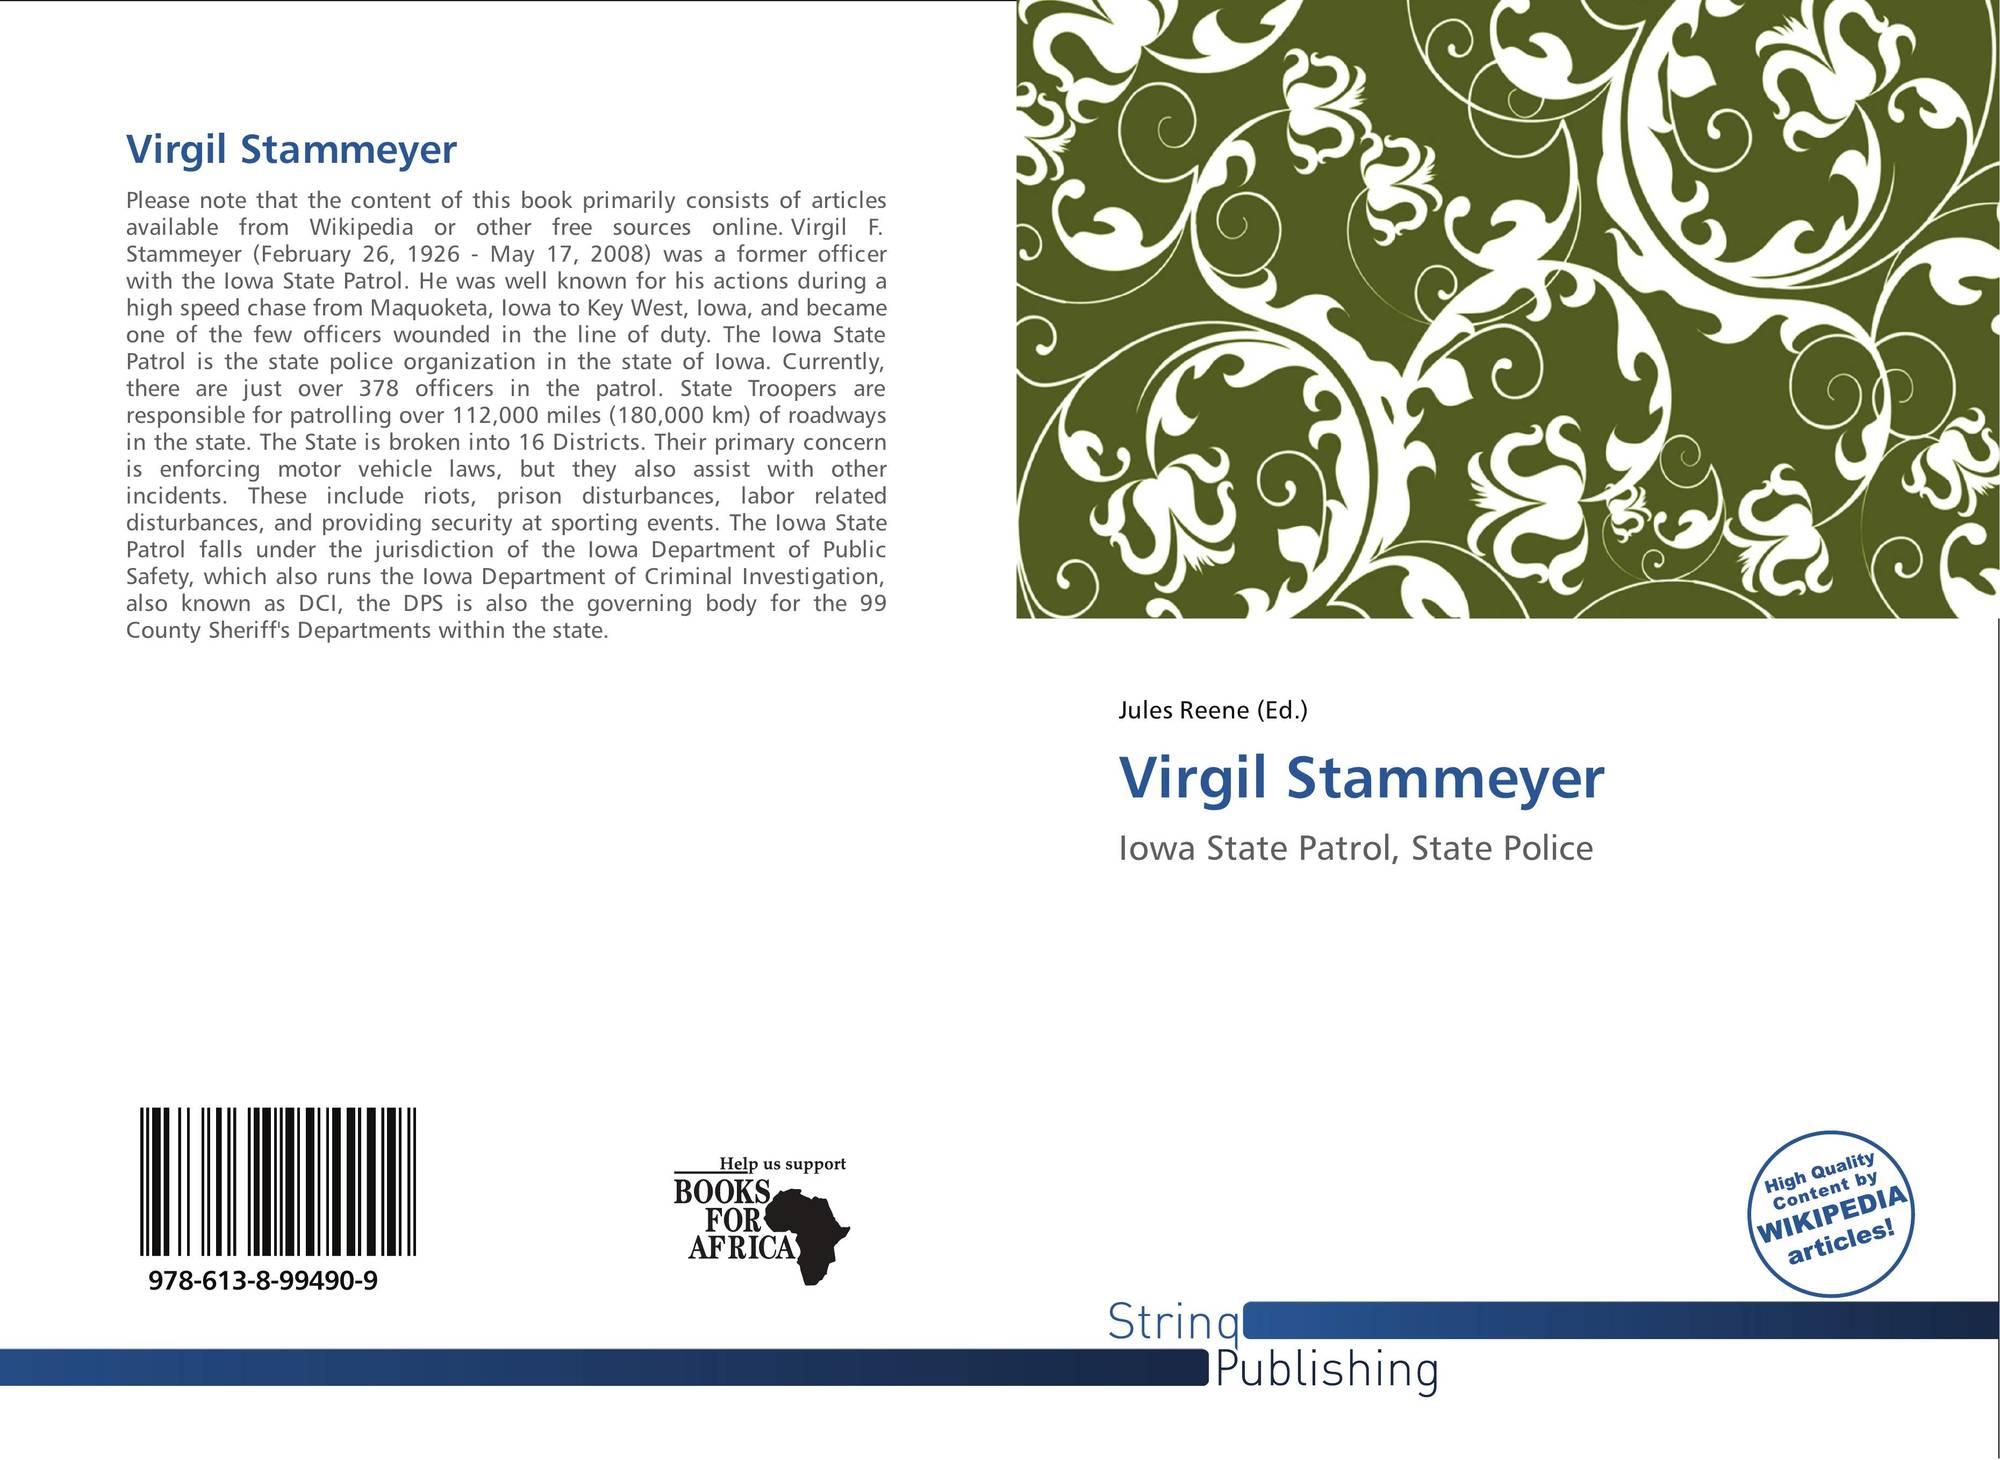 Virgil stammeyer 978 613 8 99490 9 6138994906 9786138994909 for 99490